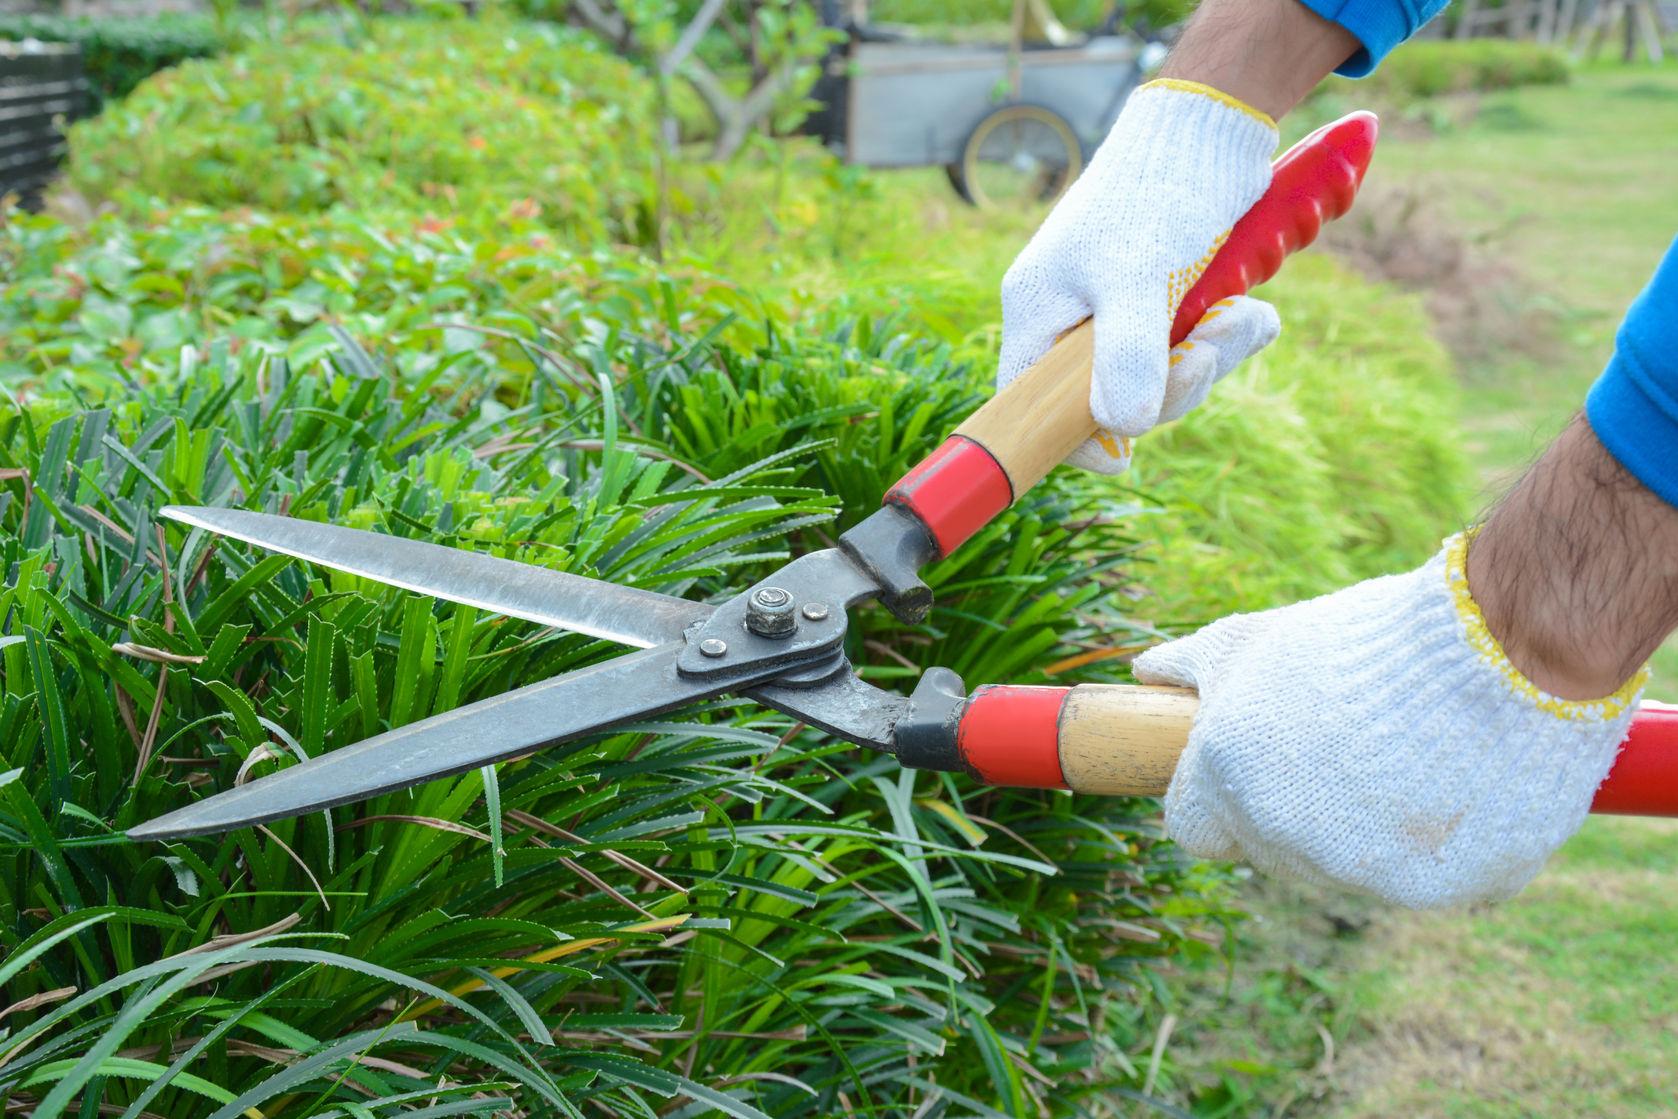 shears tools garden